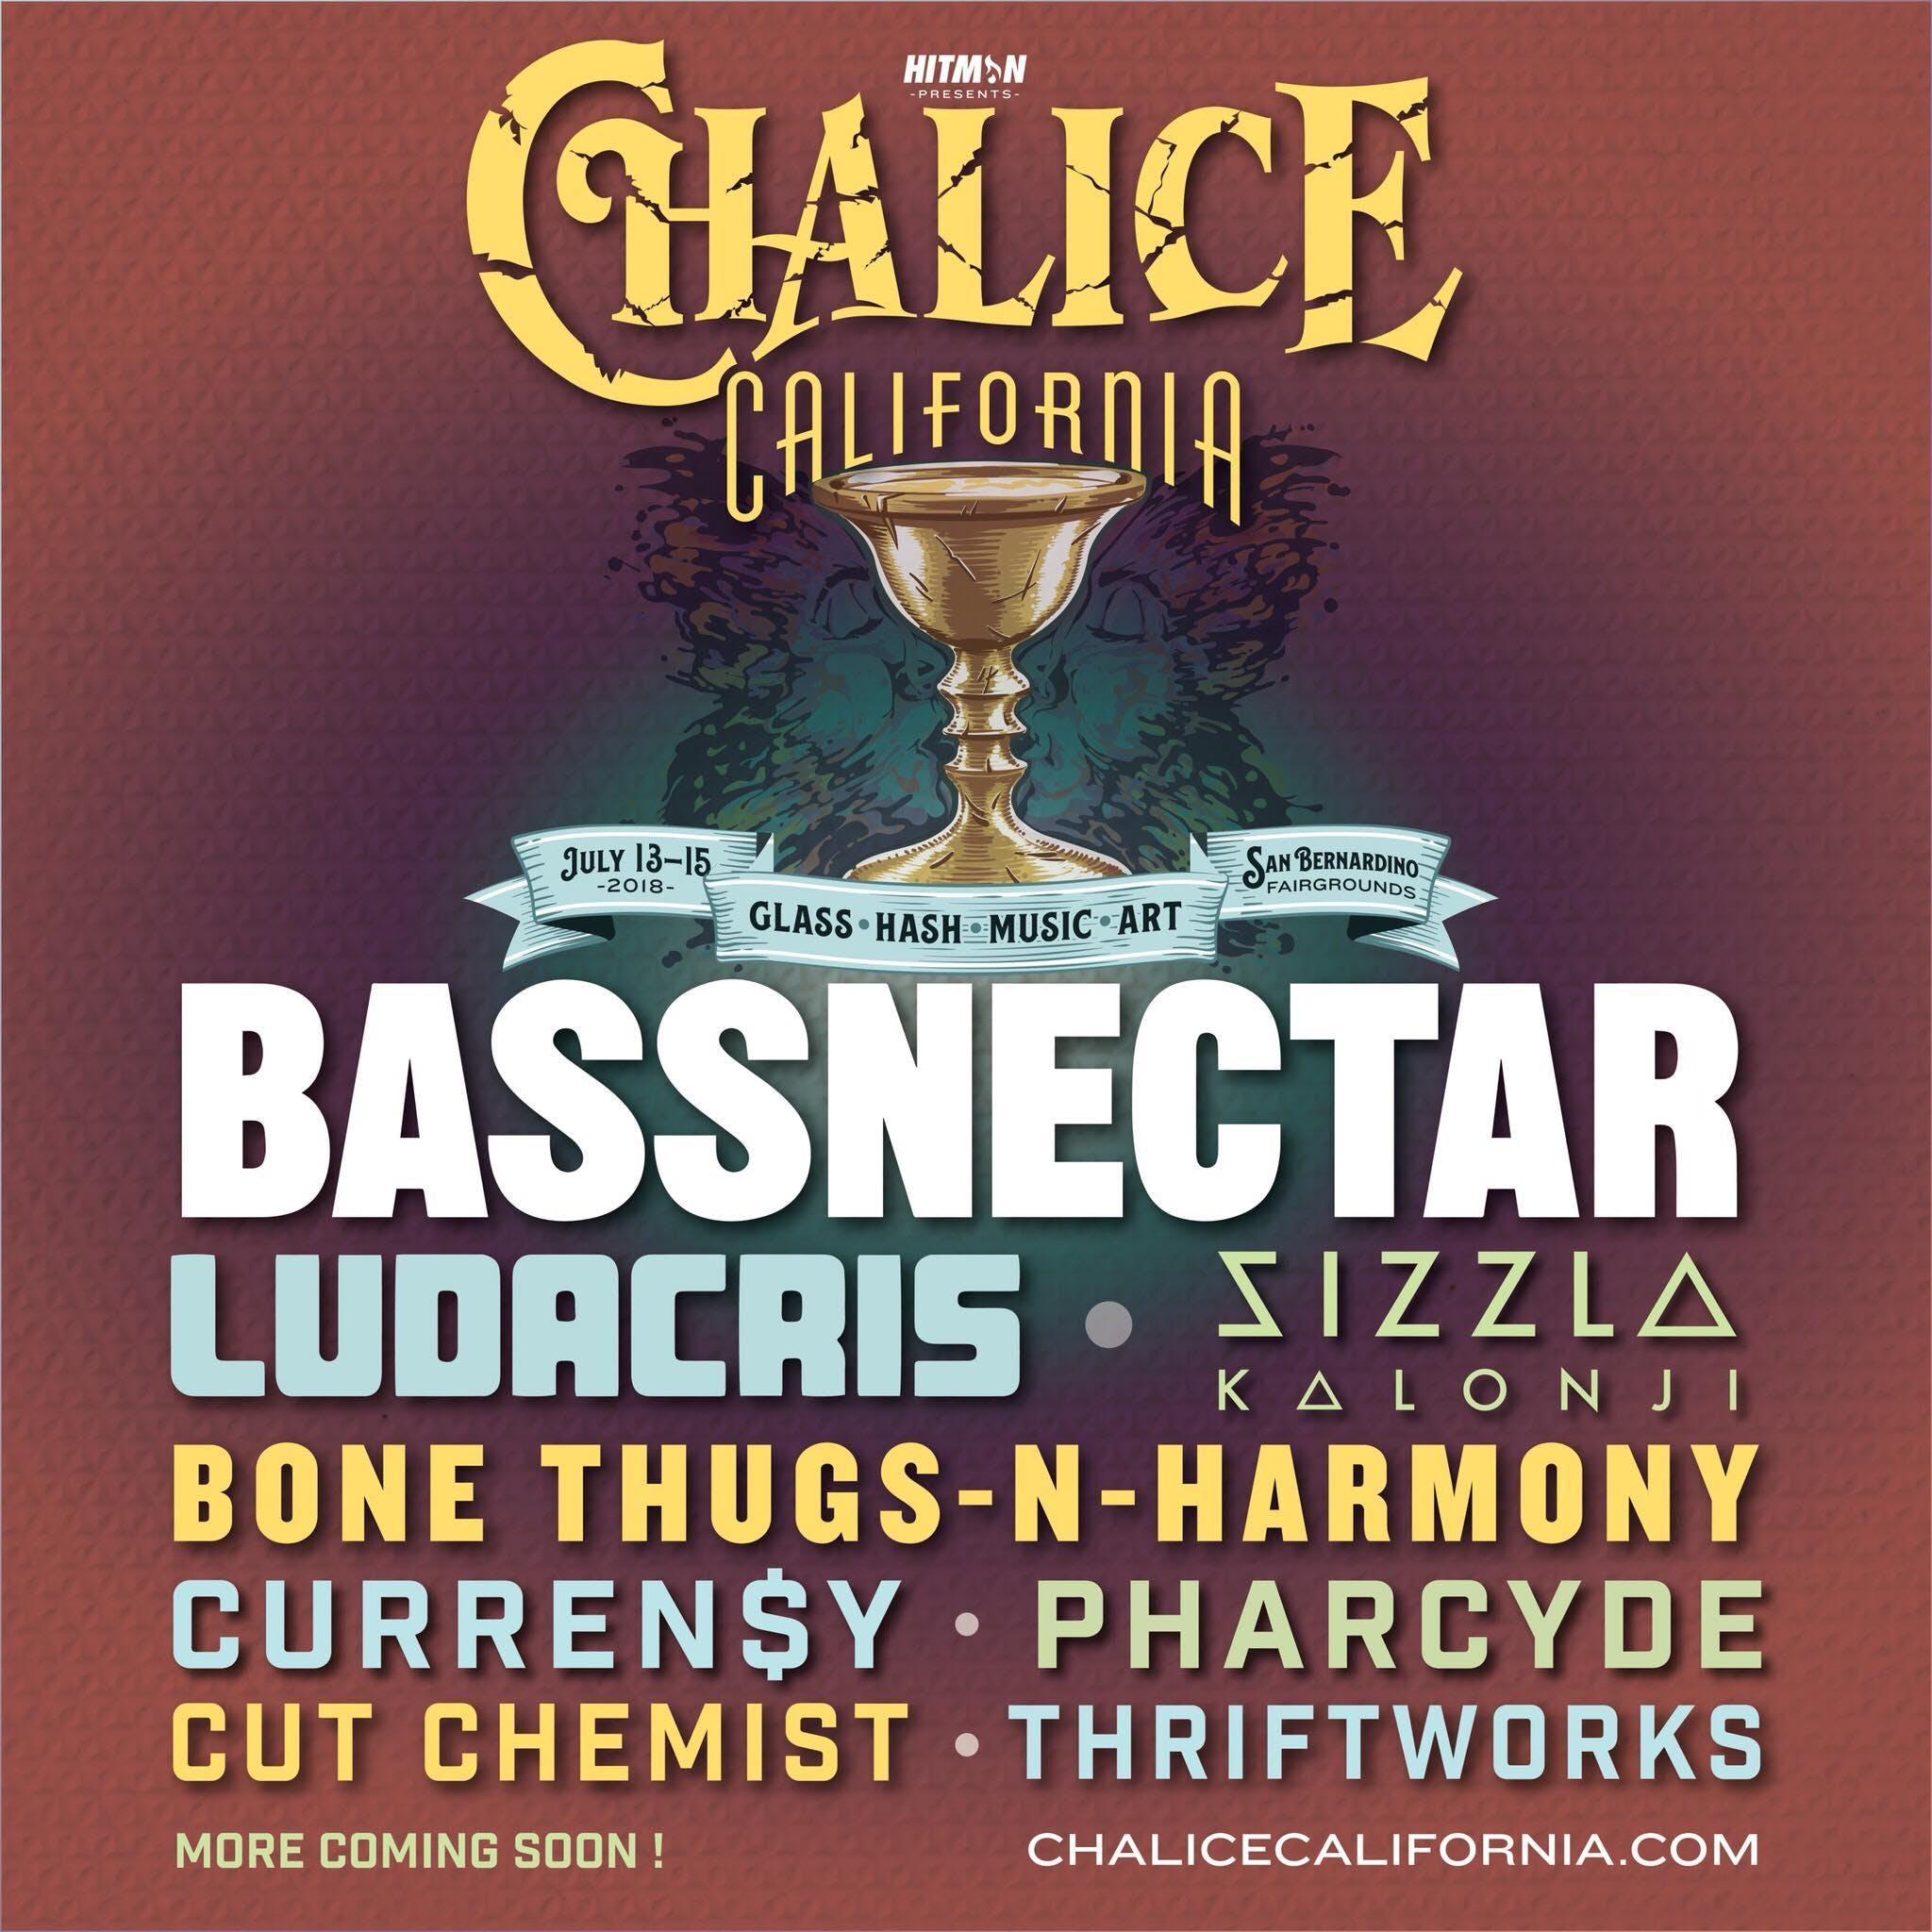 Chalice California 2018 At San Bernardino County Fairgrounds